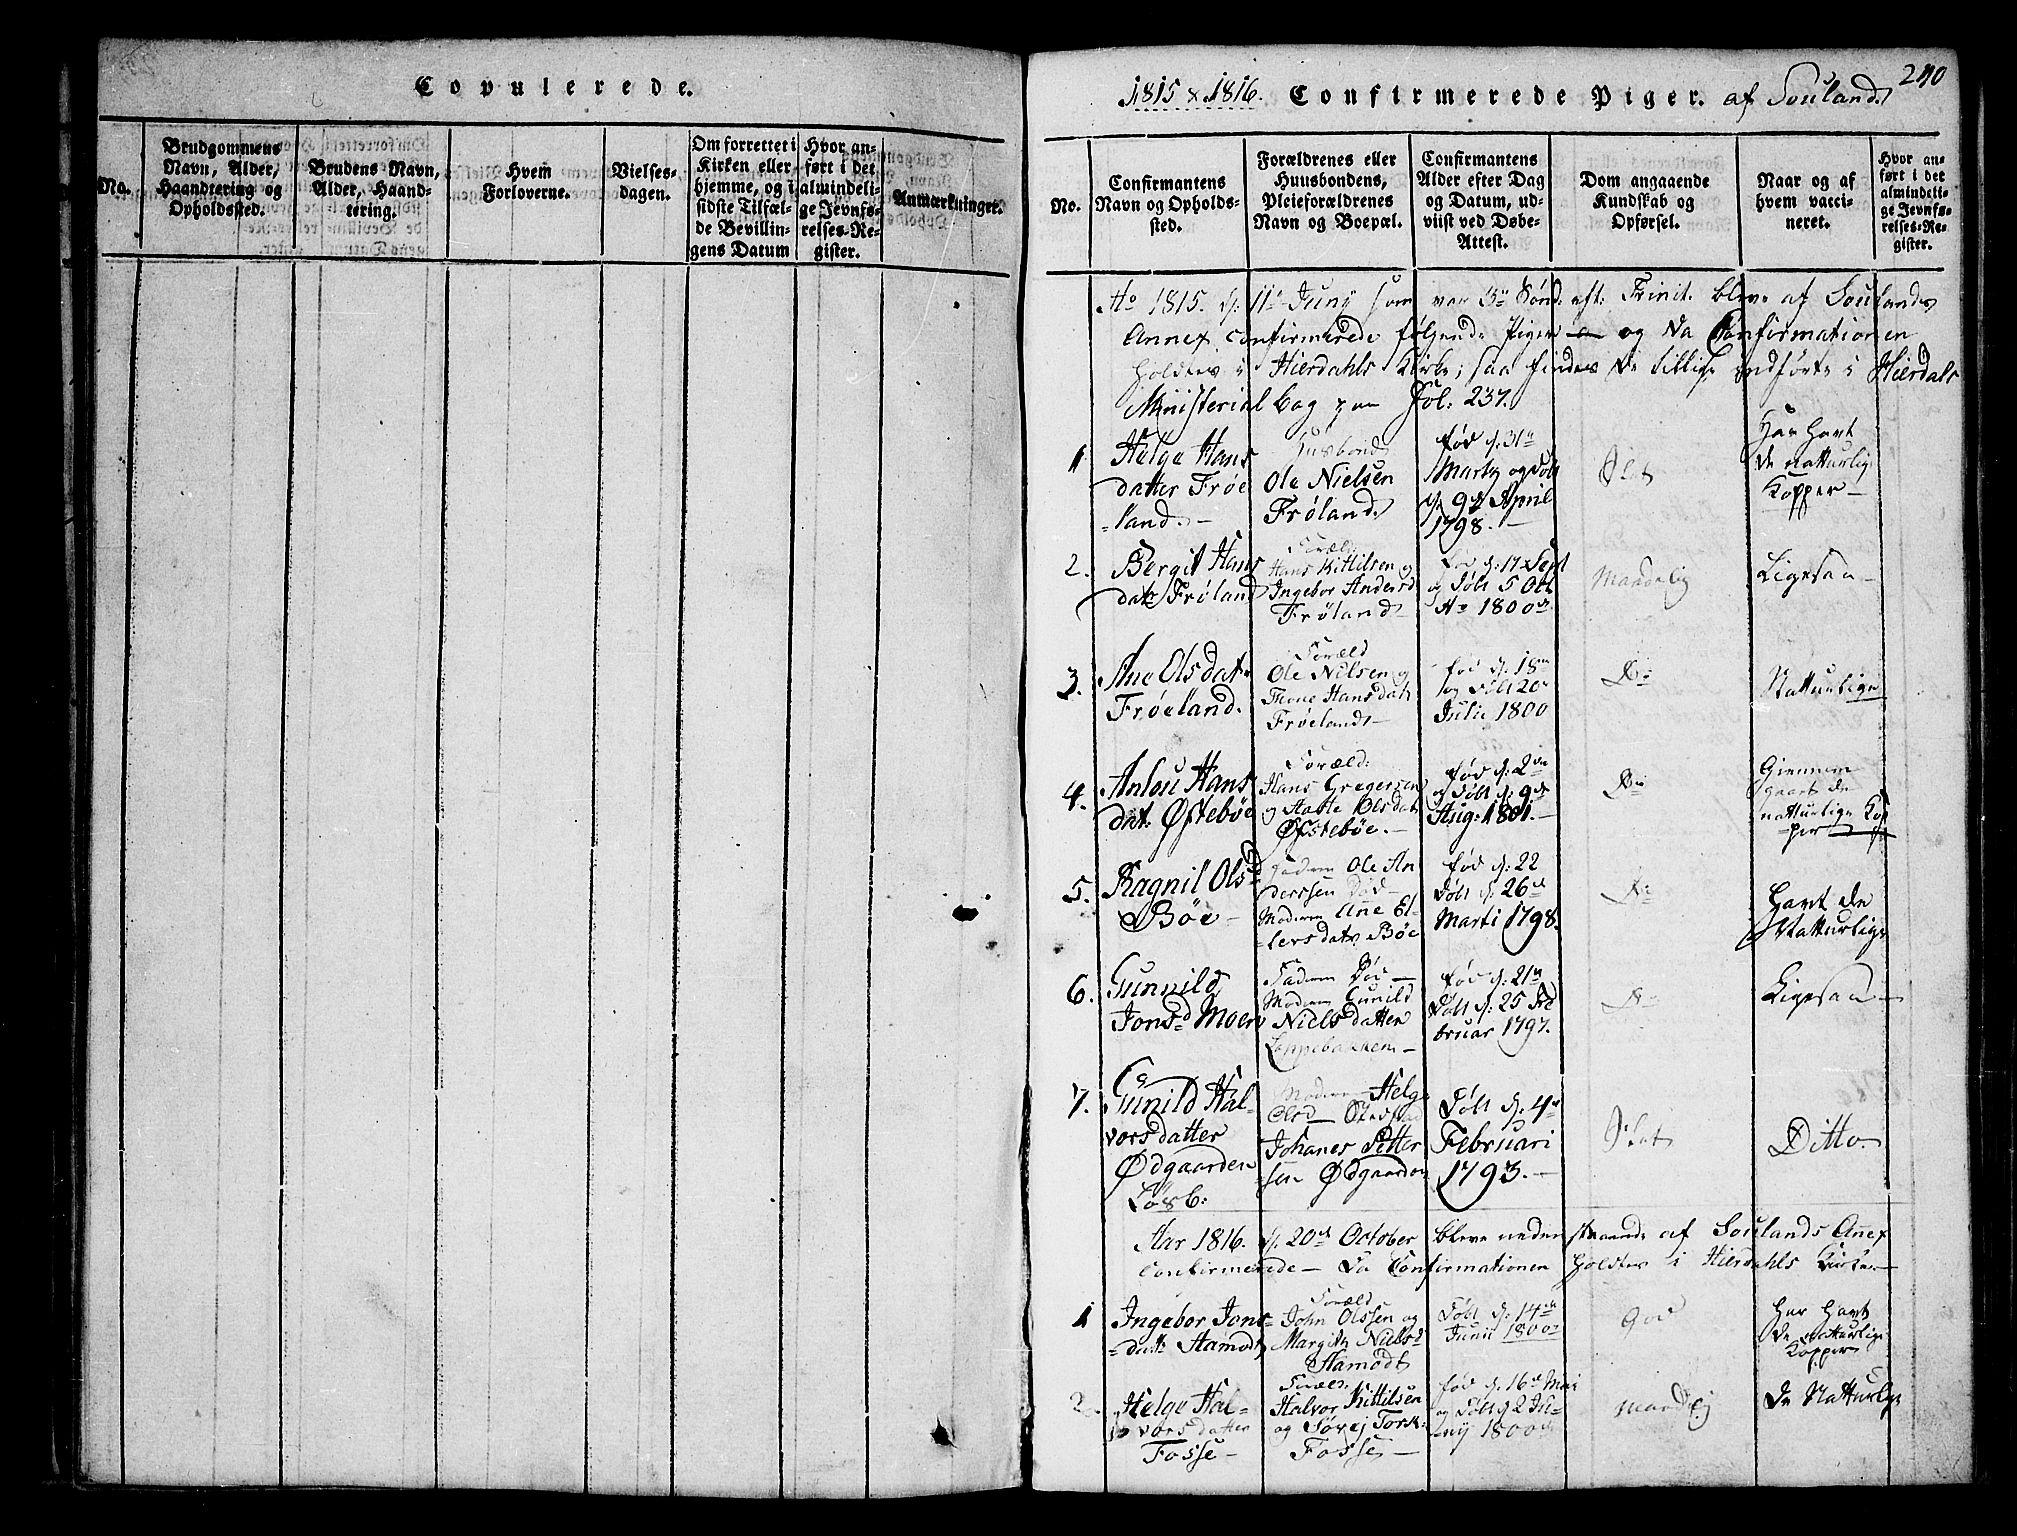 SAKO, Hjartdal kirkebøker, G/Gb/L0001: Klokkerbok nr. II 1, 1815-1842, s. 240